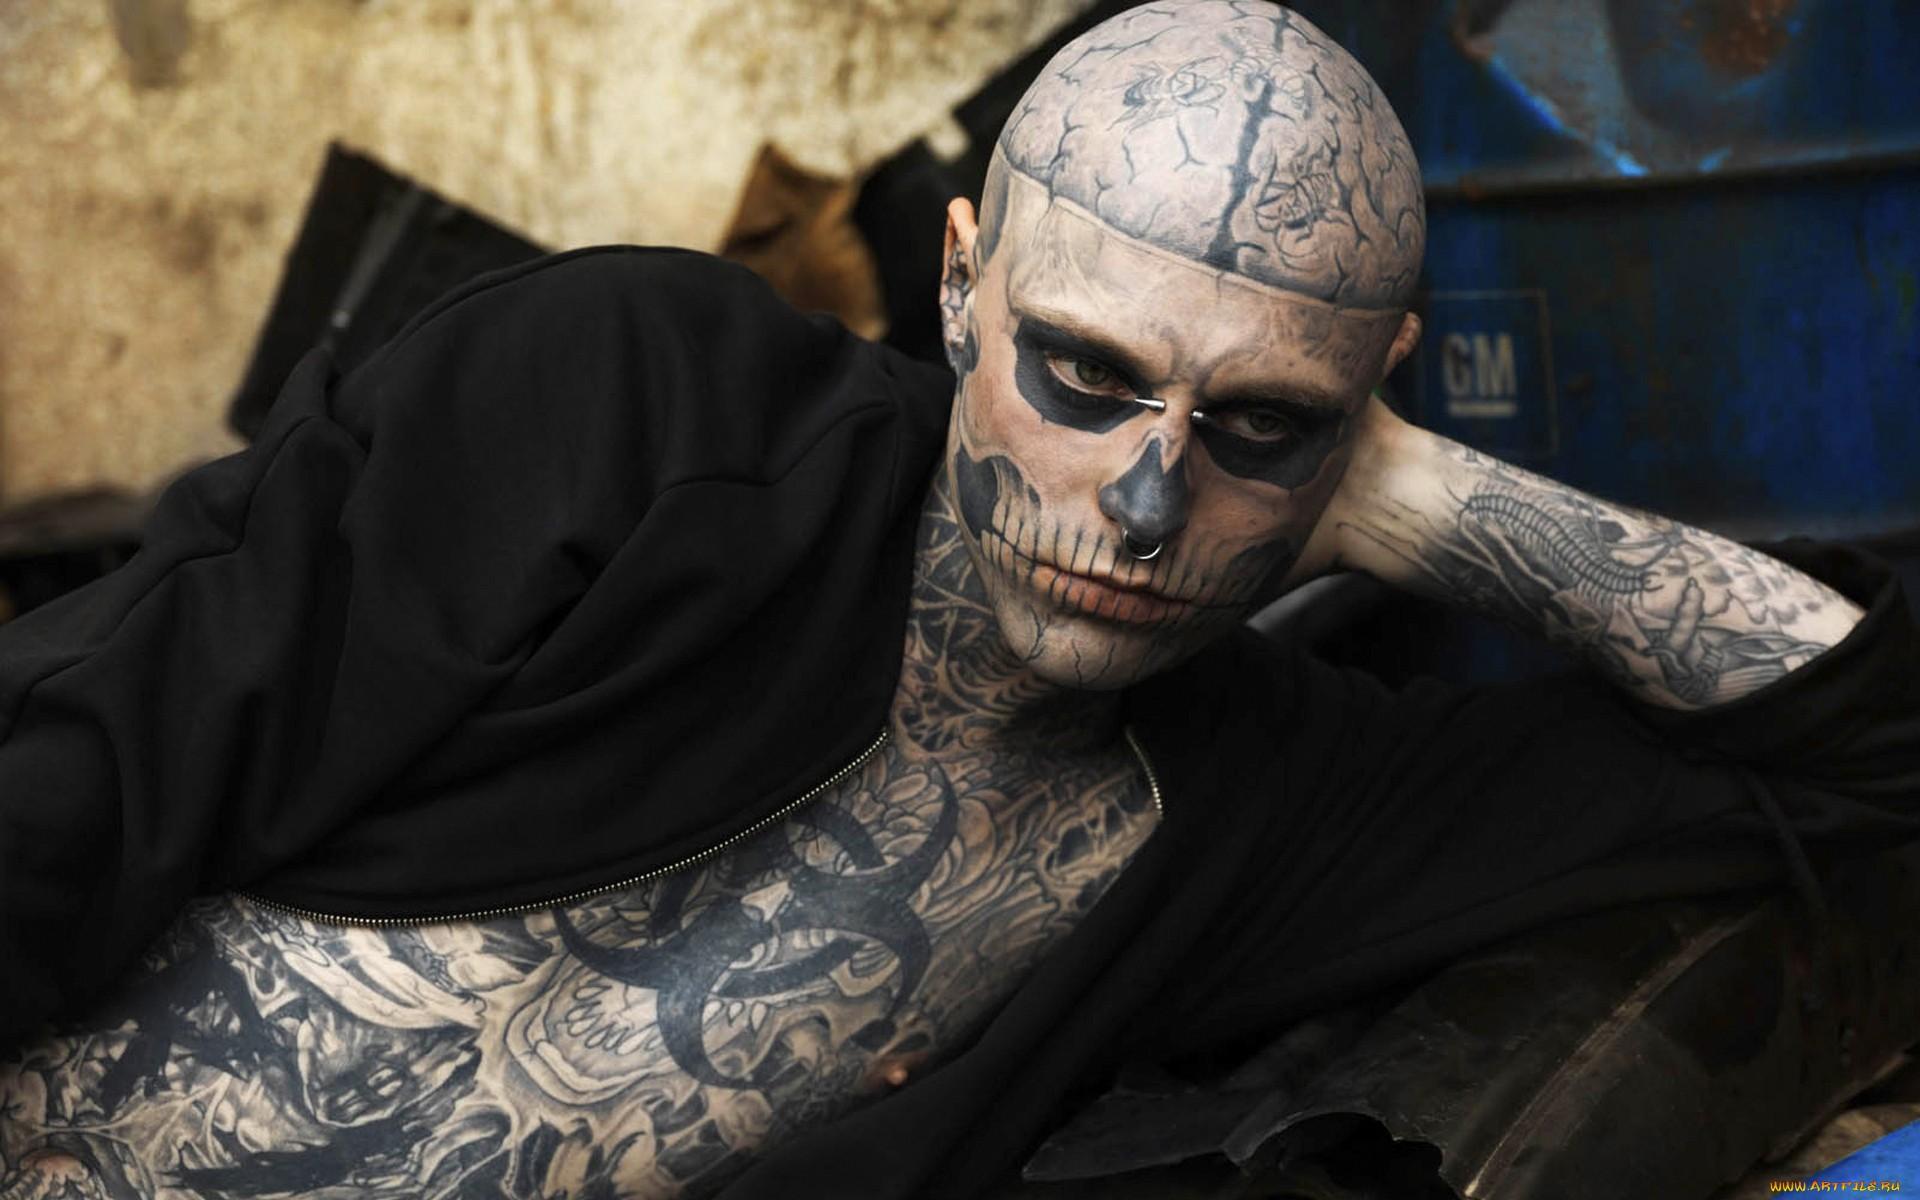 Zombie Boy Tattoo Wallpaper HD 1920x1200 ImageBankbiz 1920x1200